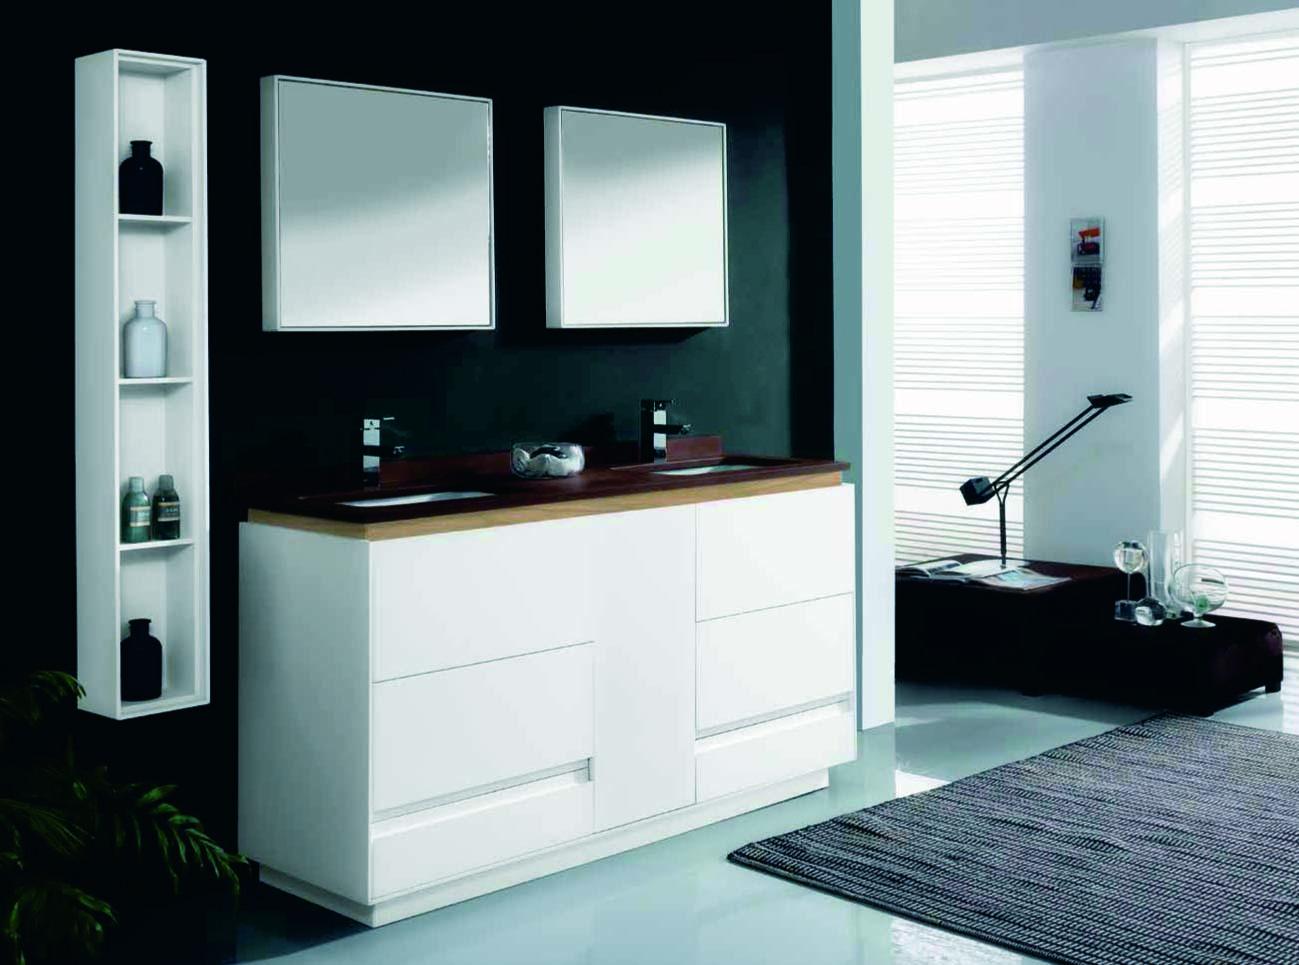 Muebles lavabo en aki for Muebles lavabo aki